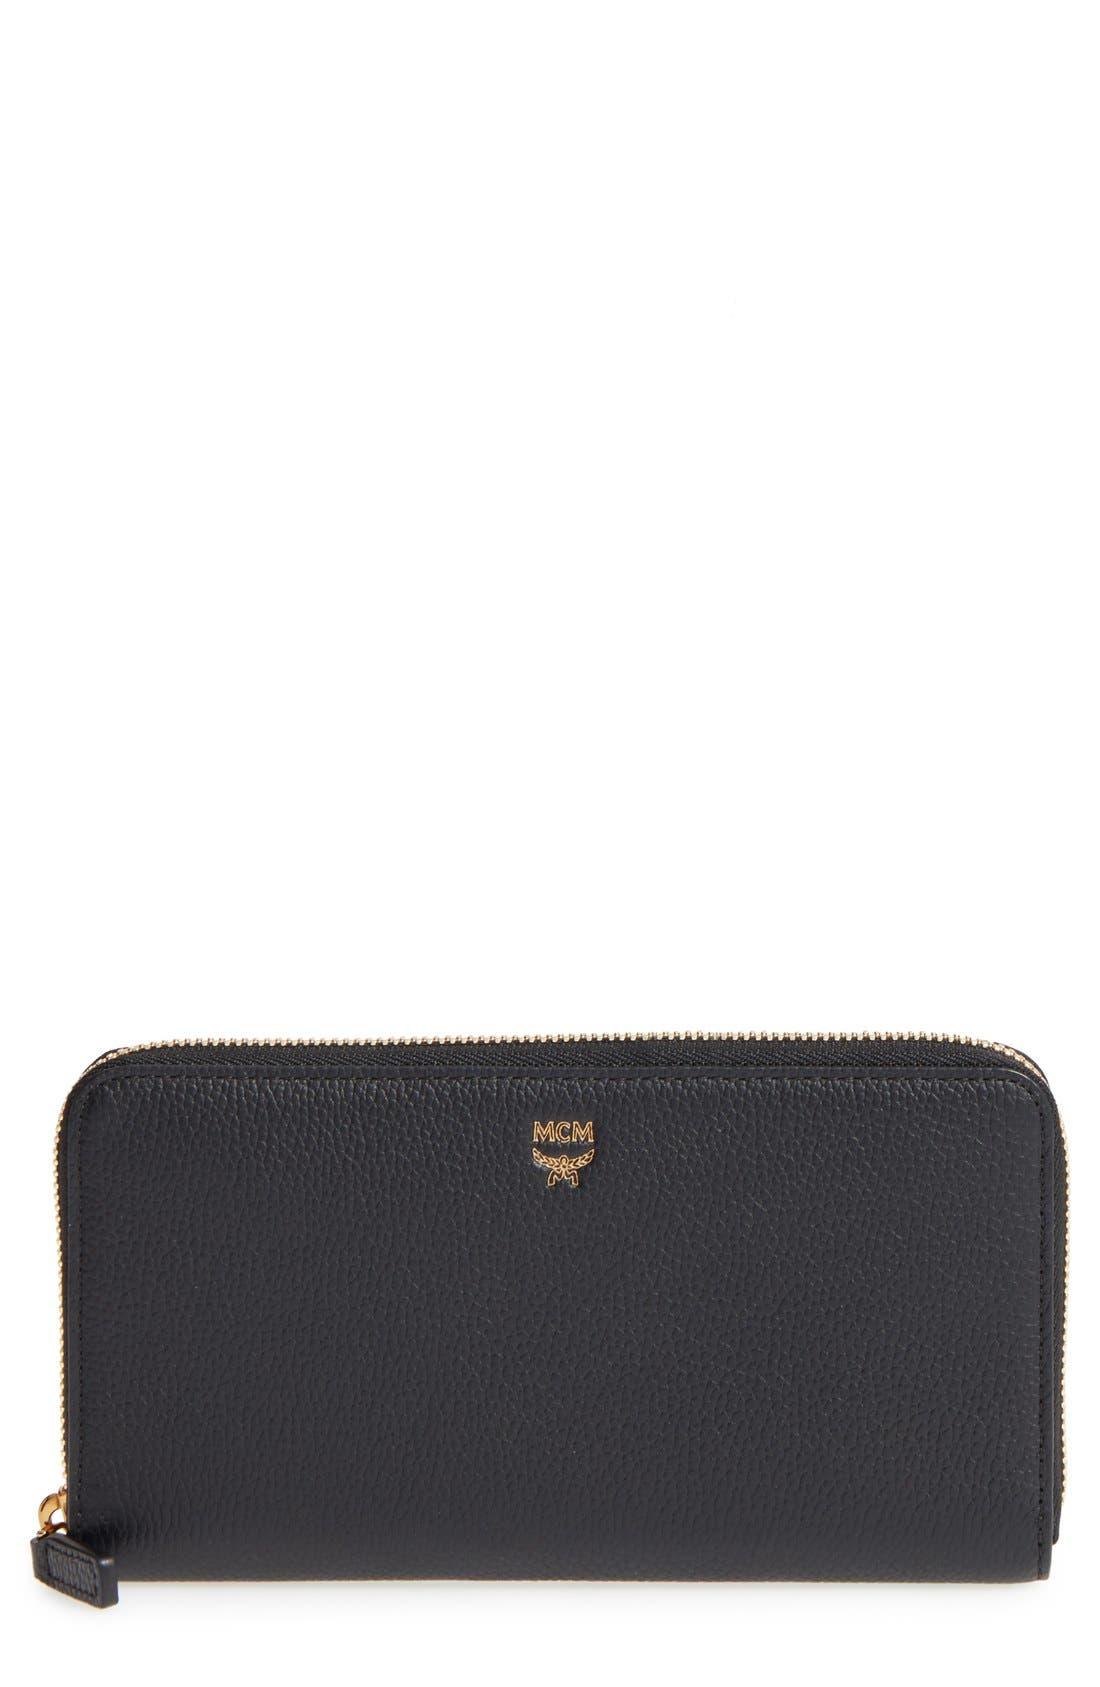 MCM Milla Leather Zip Around Wallet